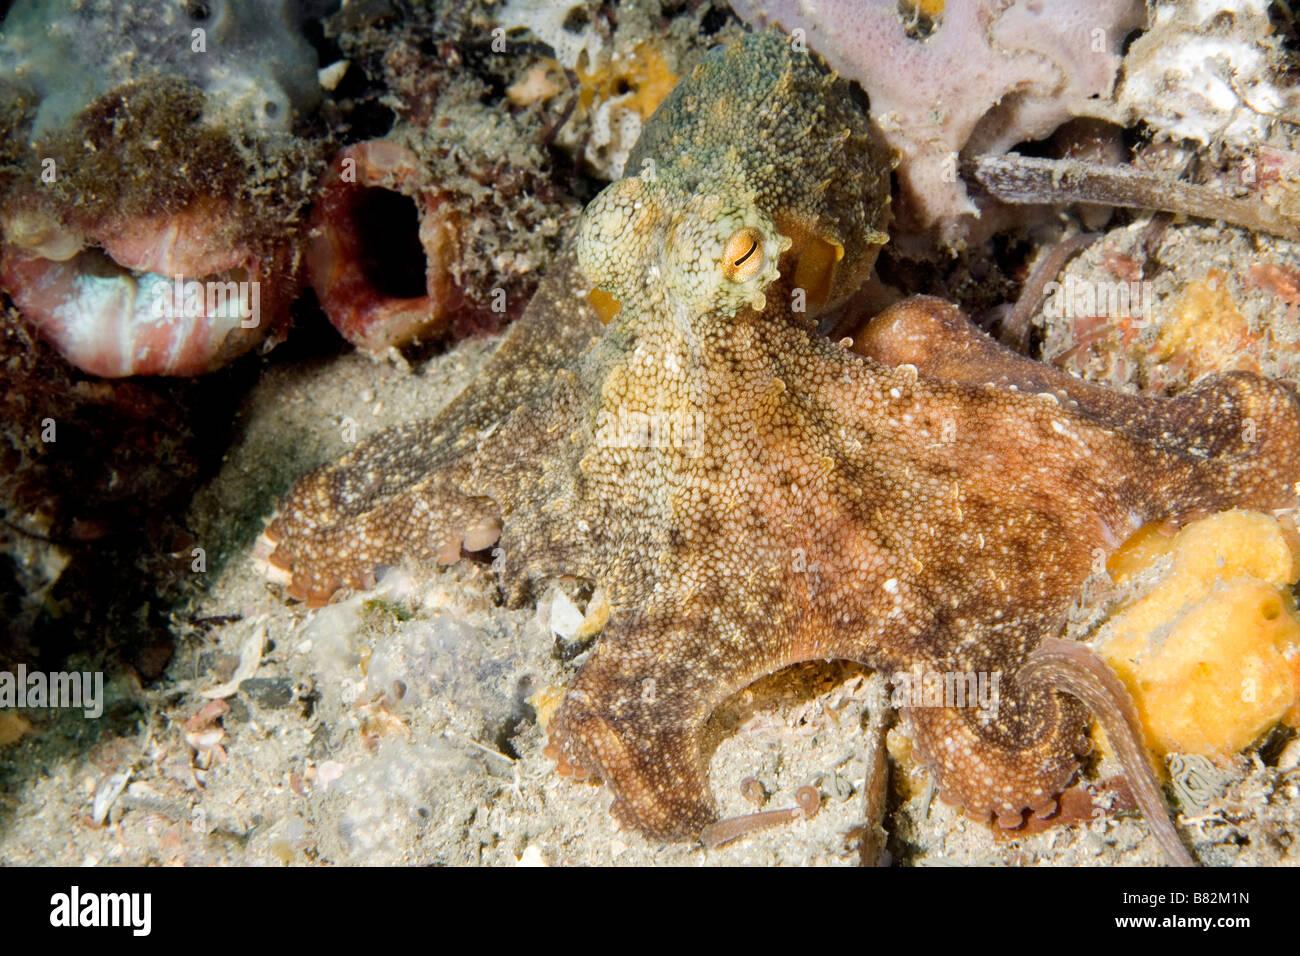 sydney-octopus-or-gloomy-octopus-octopus